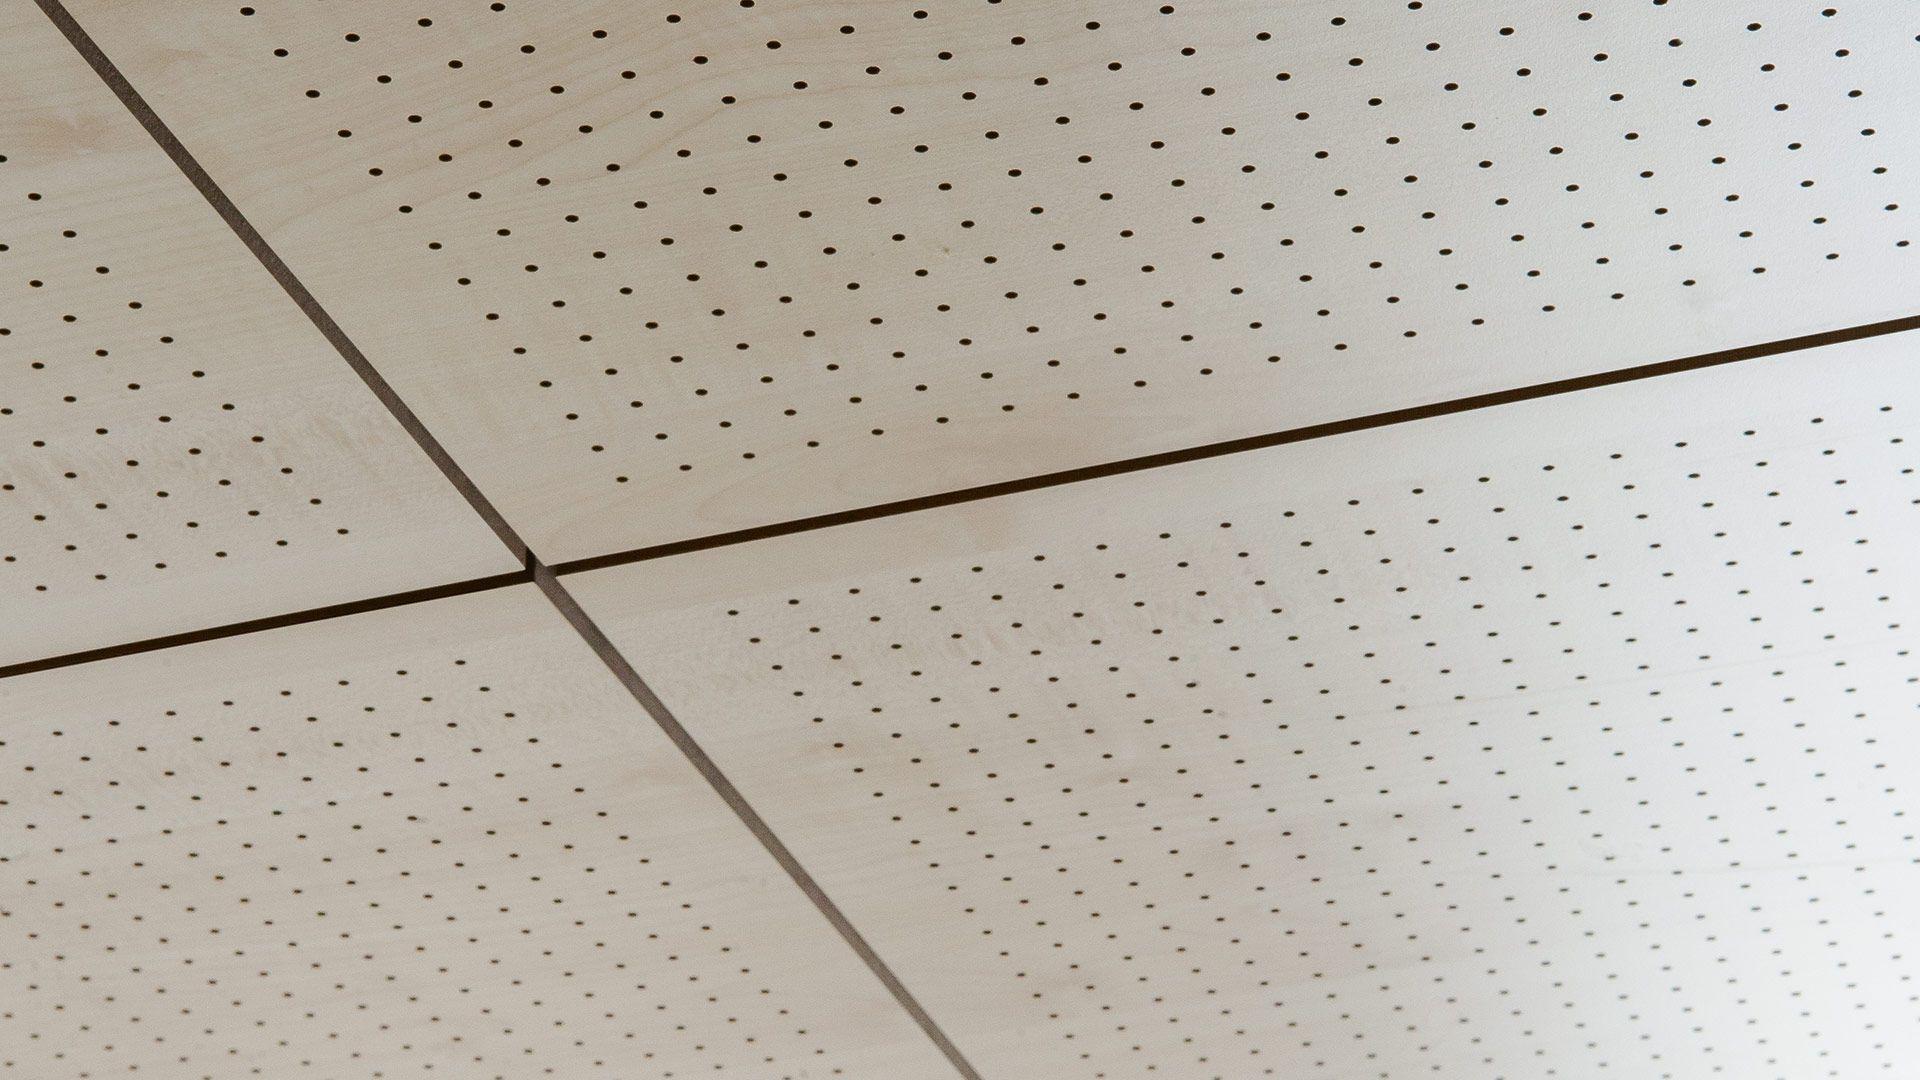 Falso Techo Acustico De Mdf Tipo Panel En Losa 60 X 120 Fantoni Faux Plafond Faux Plafond Suspendu Plafond Suspendu